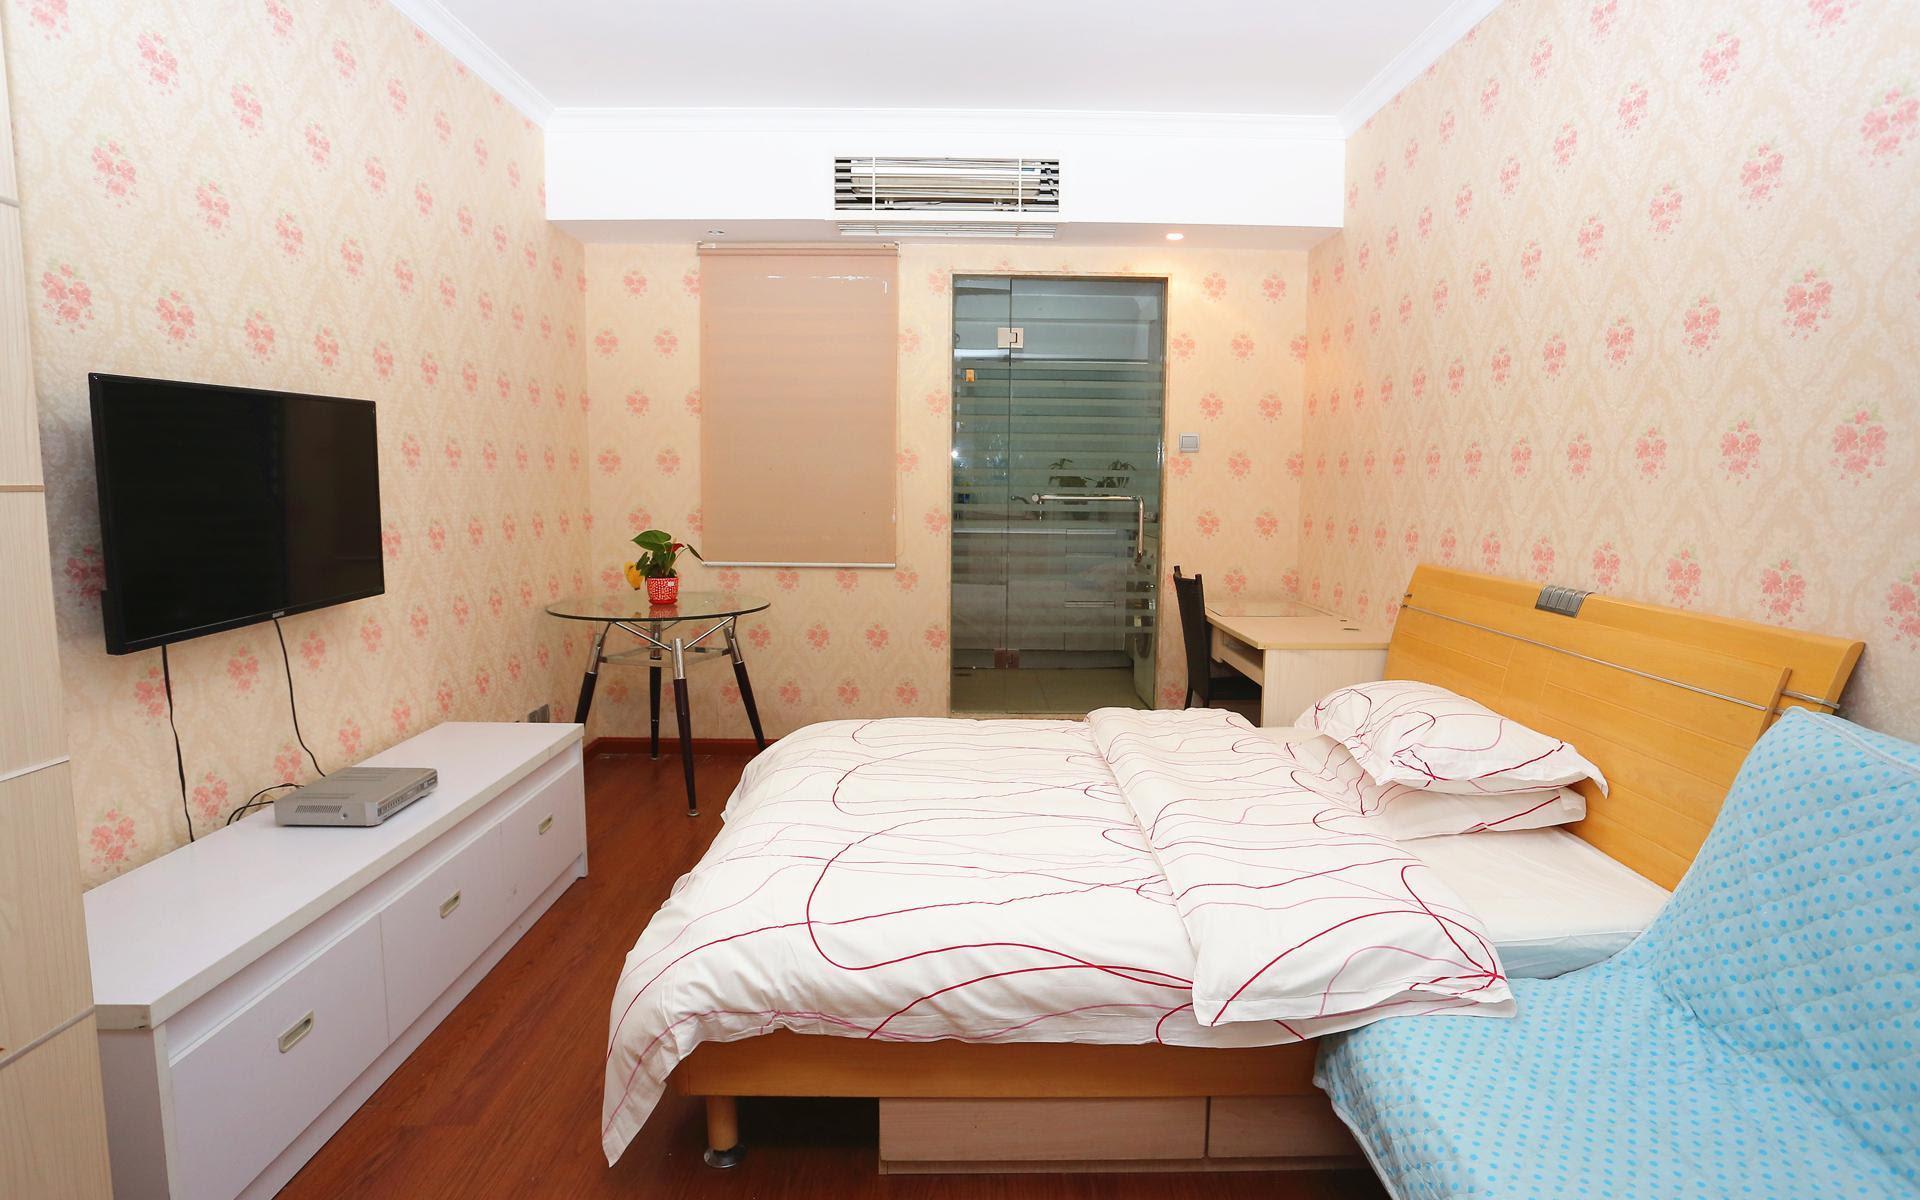 hotel near Shenzhen JIAXIN Superior 1 Bed Apartment